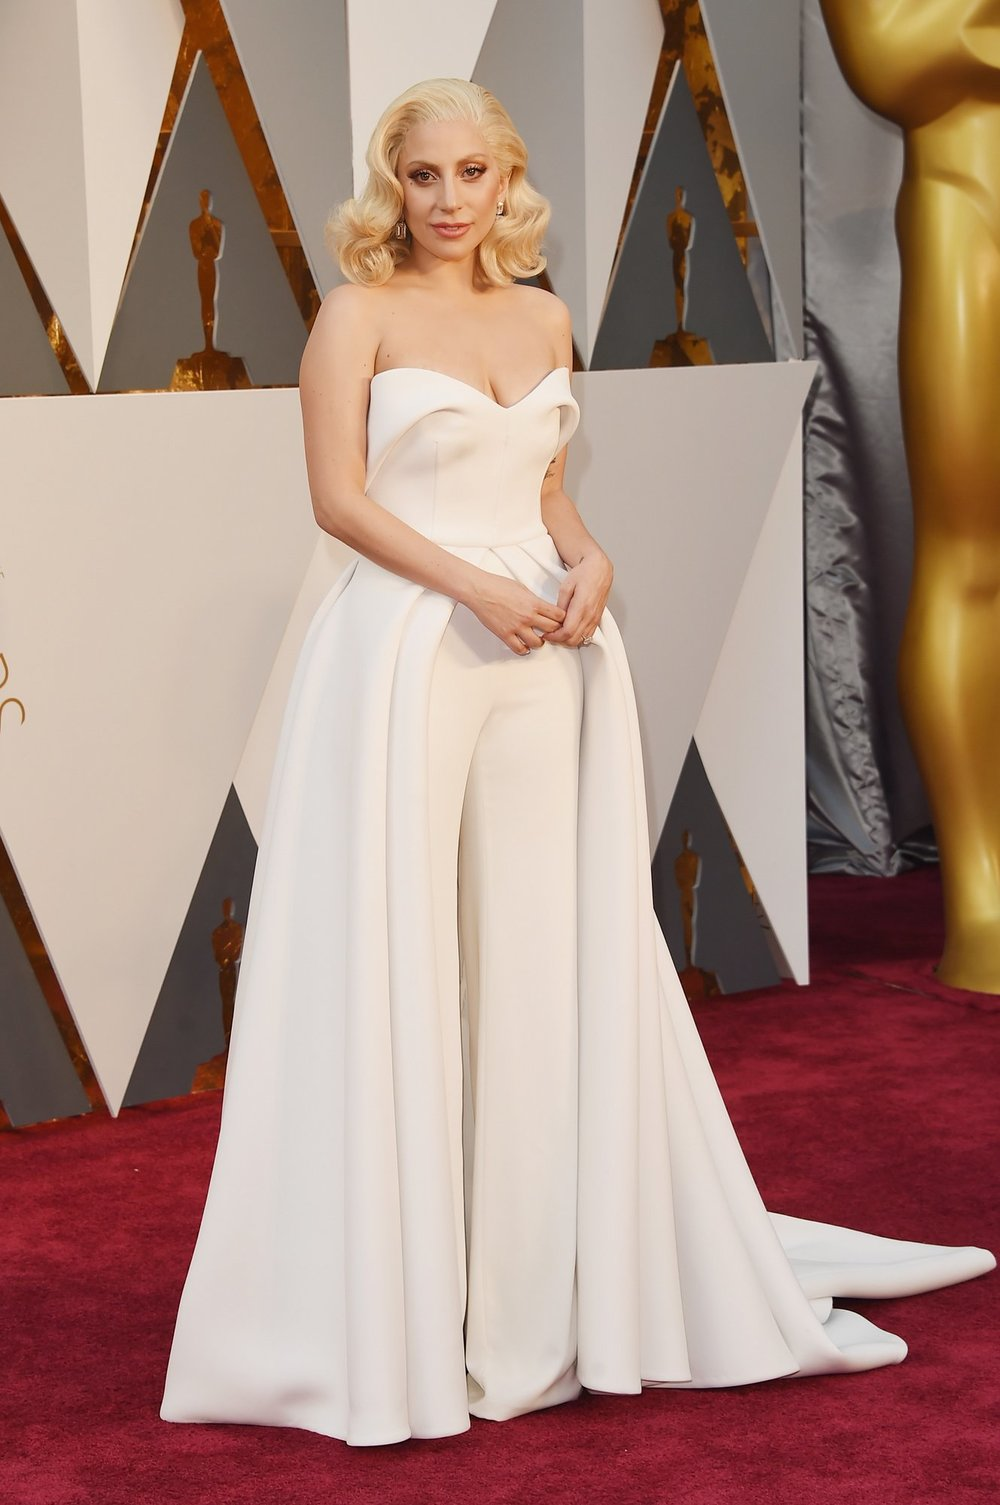 We love Brandon Maxwell and Lady Gaga, but this ensemble didn't quiet work for Gaga.